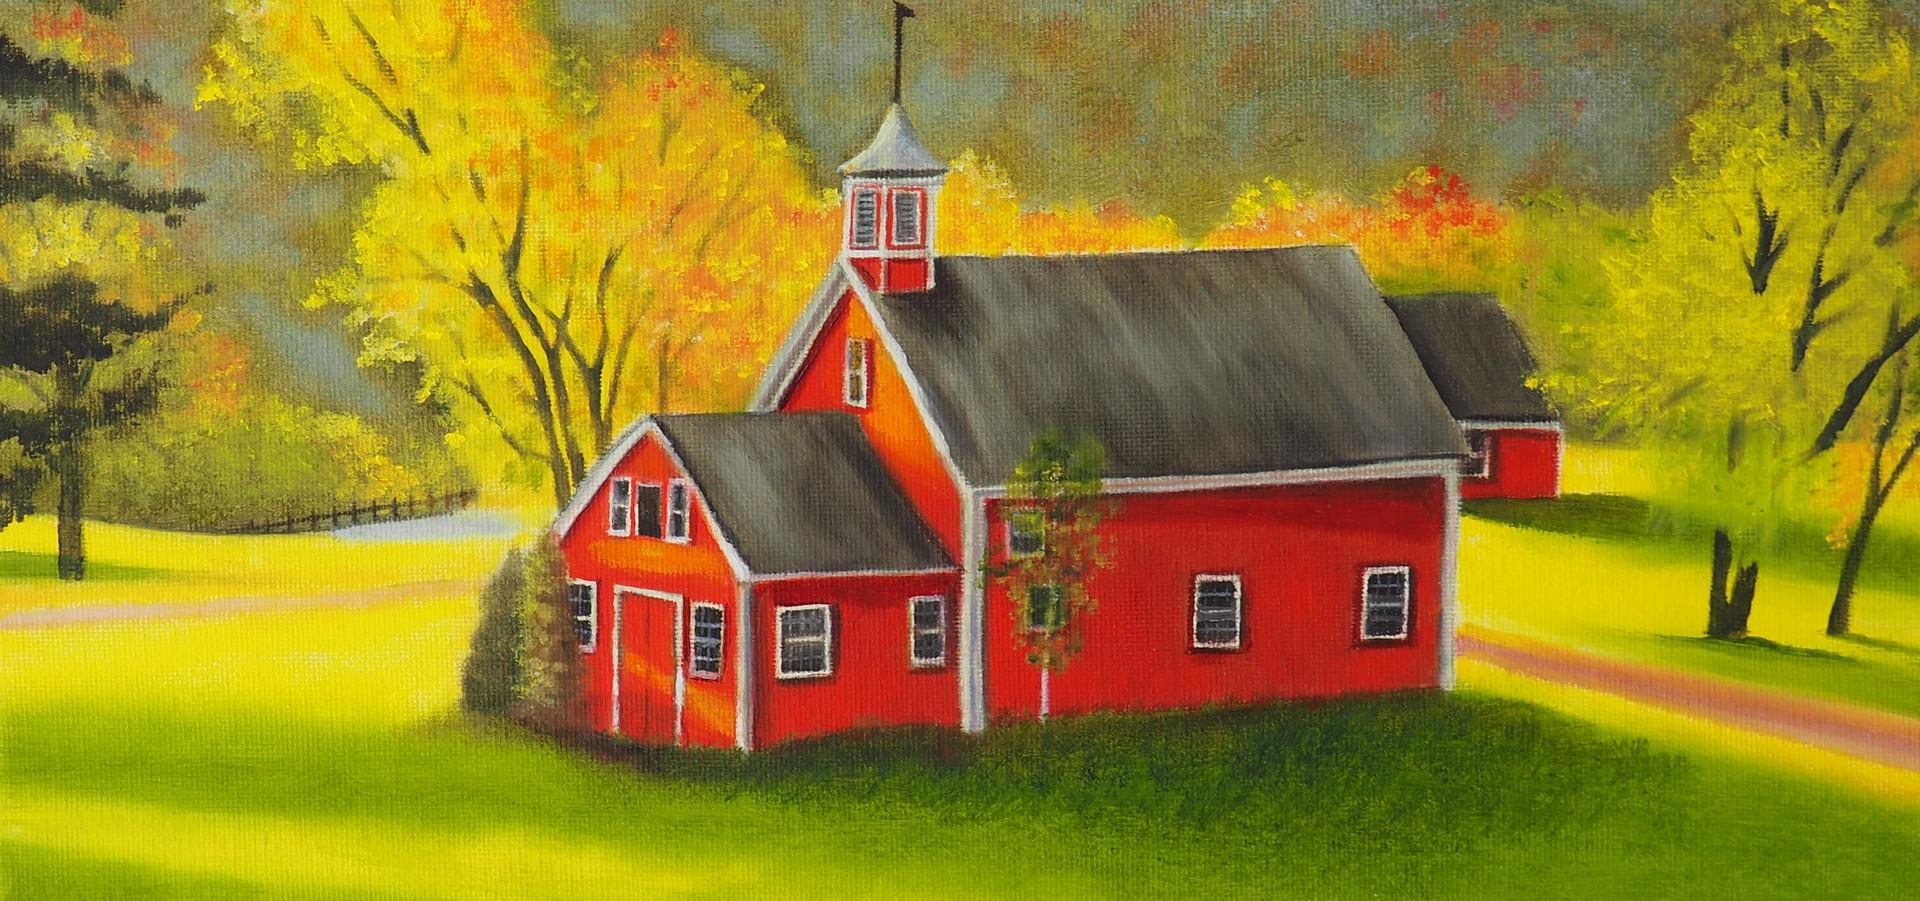 School House in the Fall.JPG